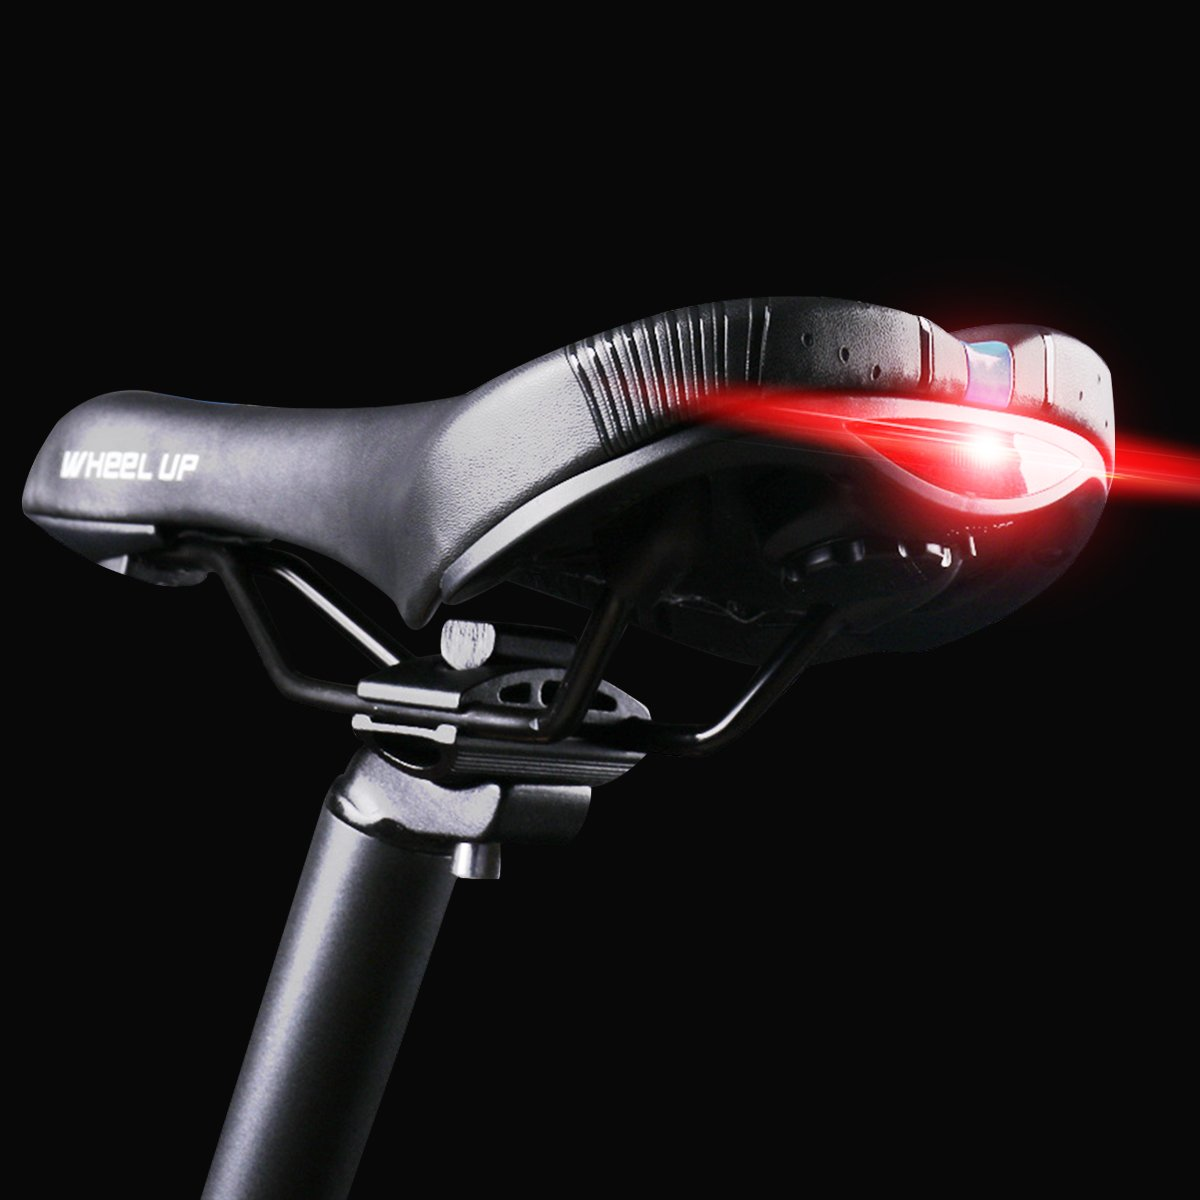 MonkeyJack 10Pcs 28.6mm Bike Stem Headset Spacer Kit for MTB BMX Mountain Bike Road Bike